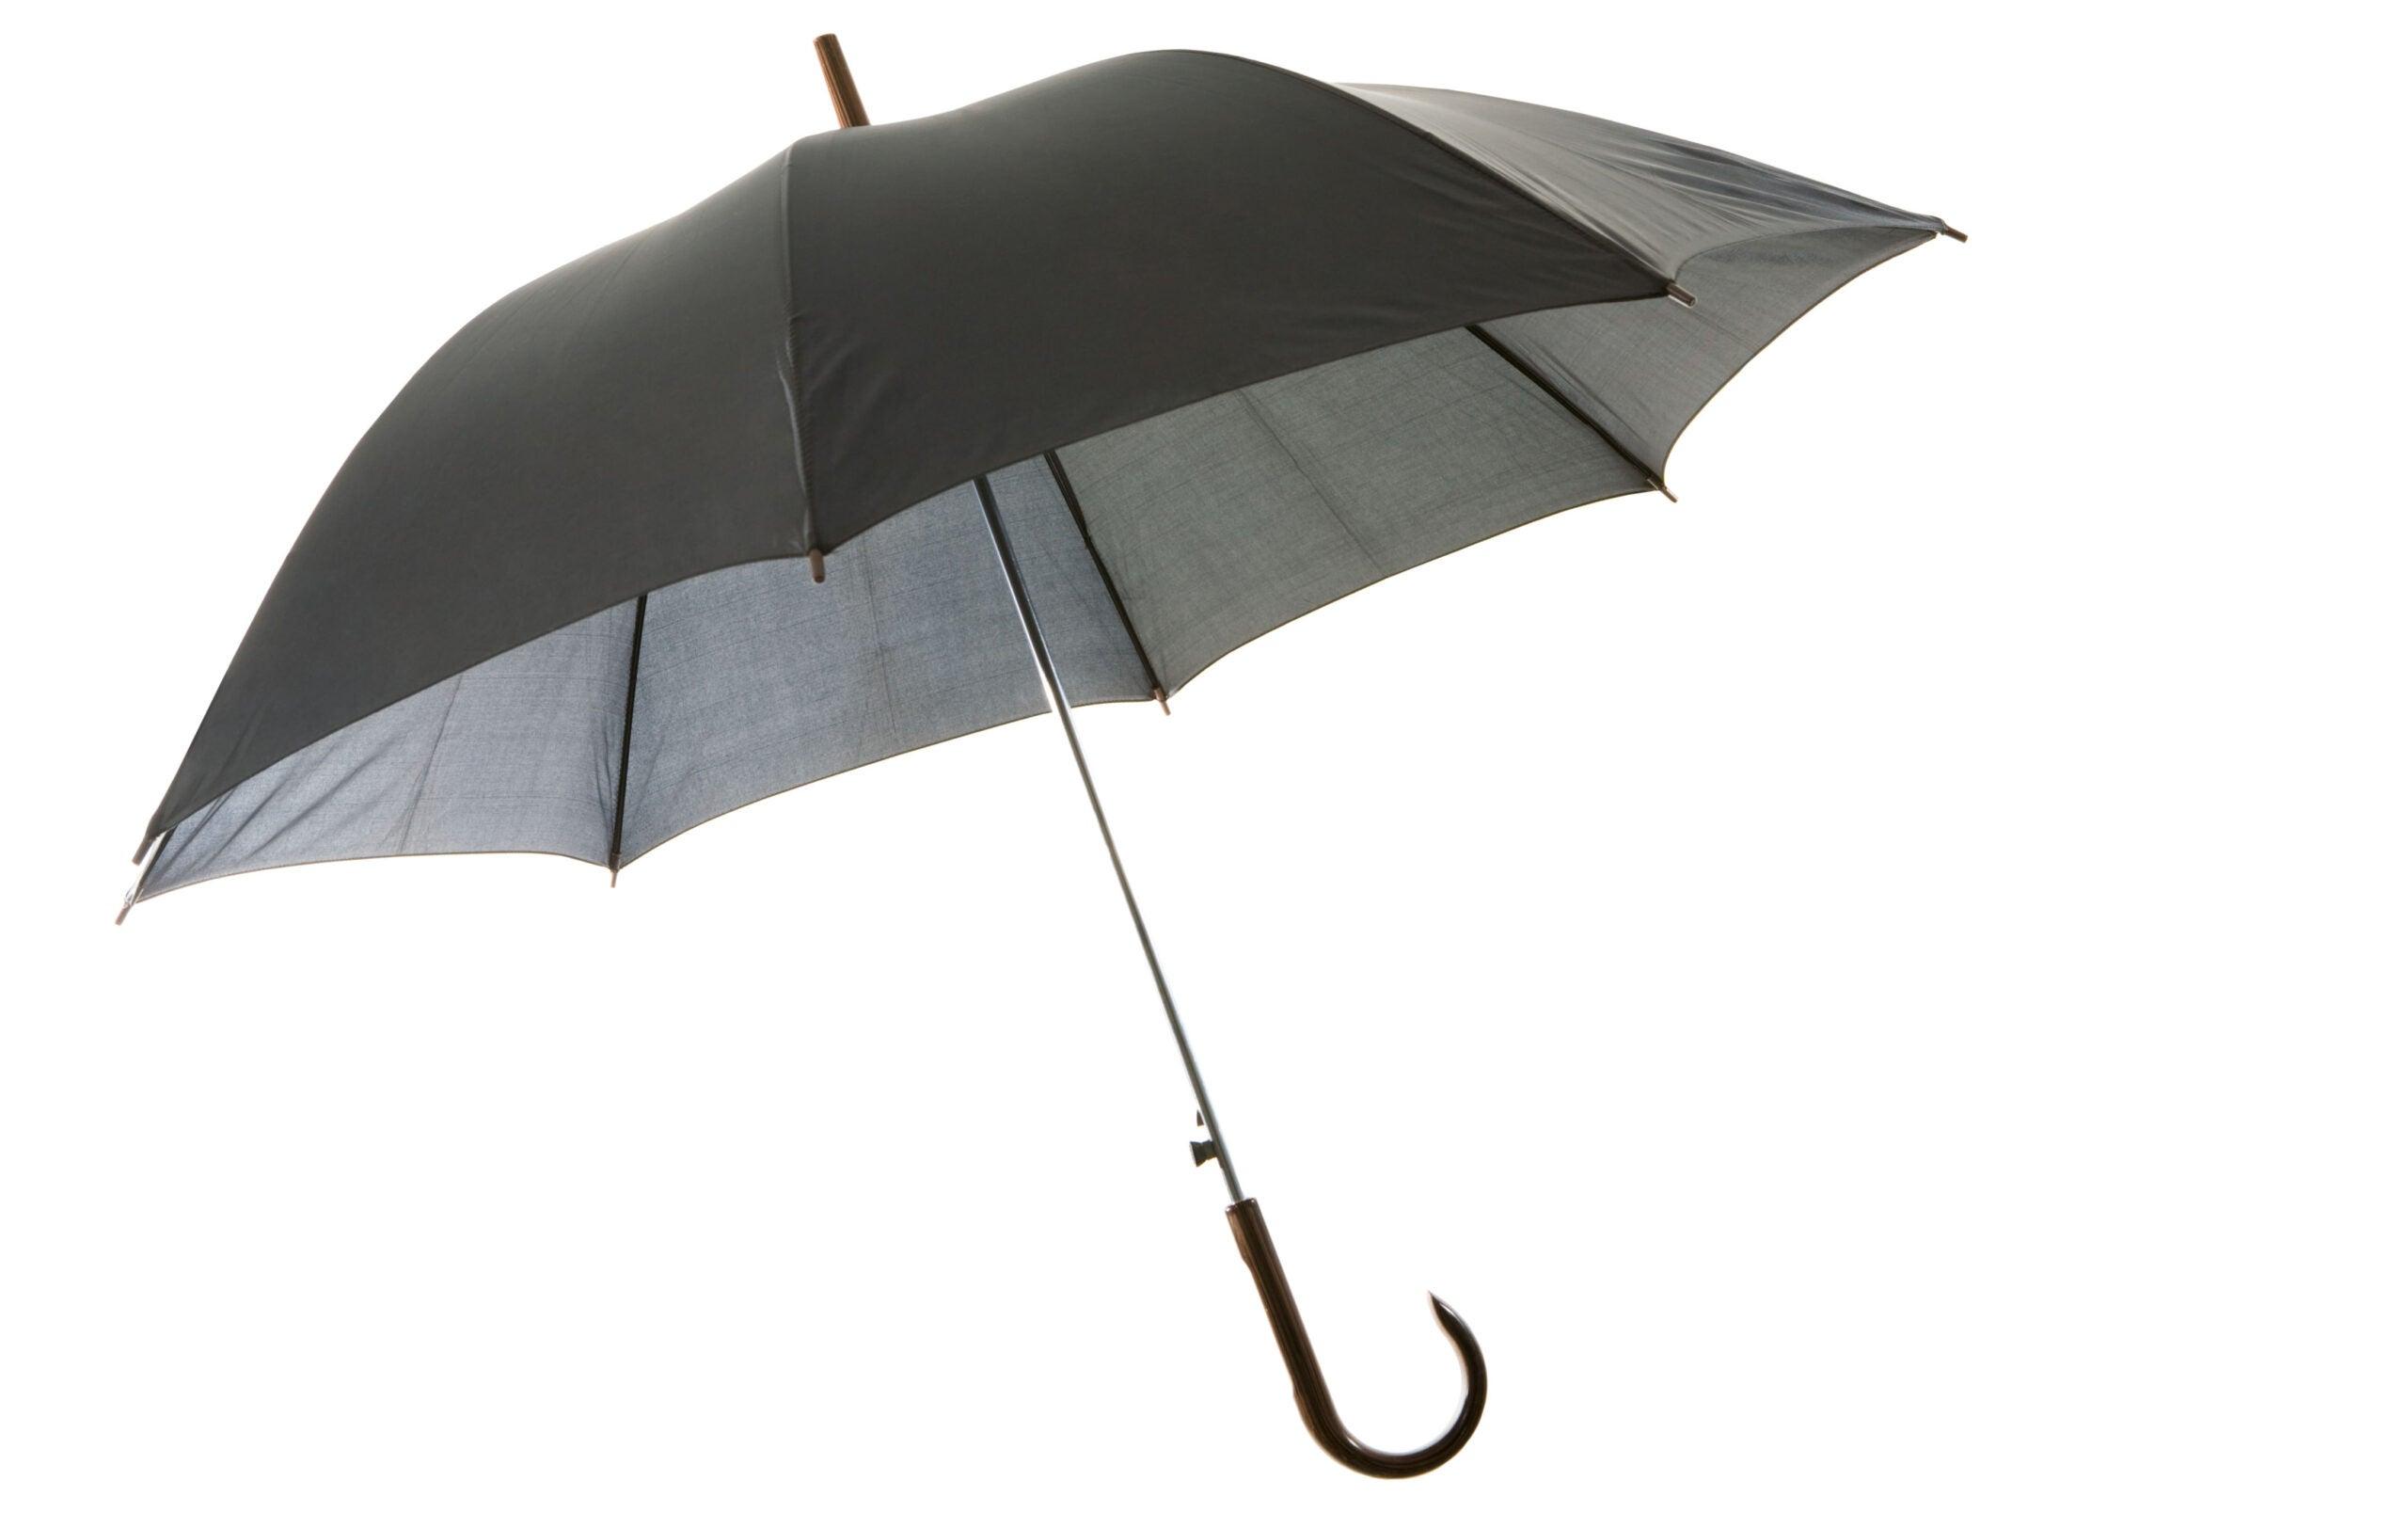 How to Make an Umbrella Duck Blind